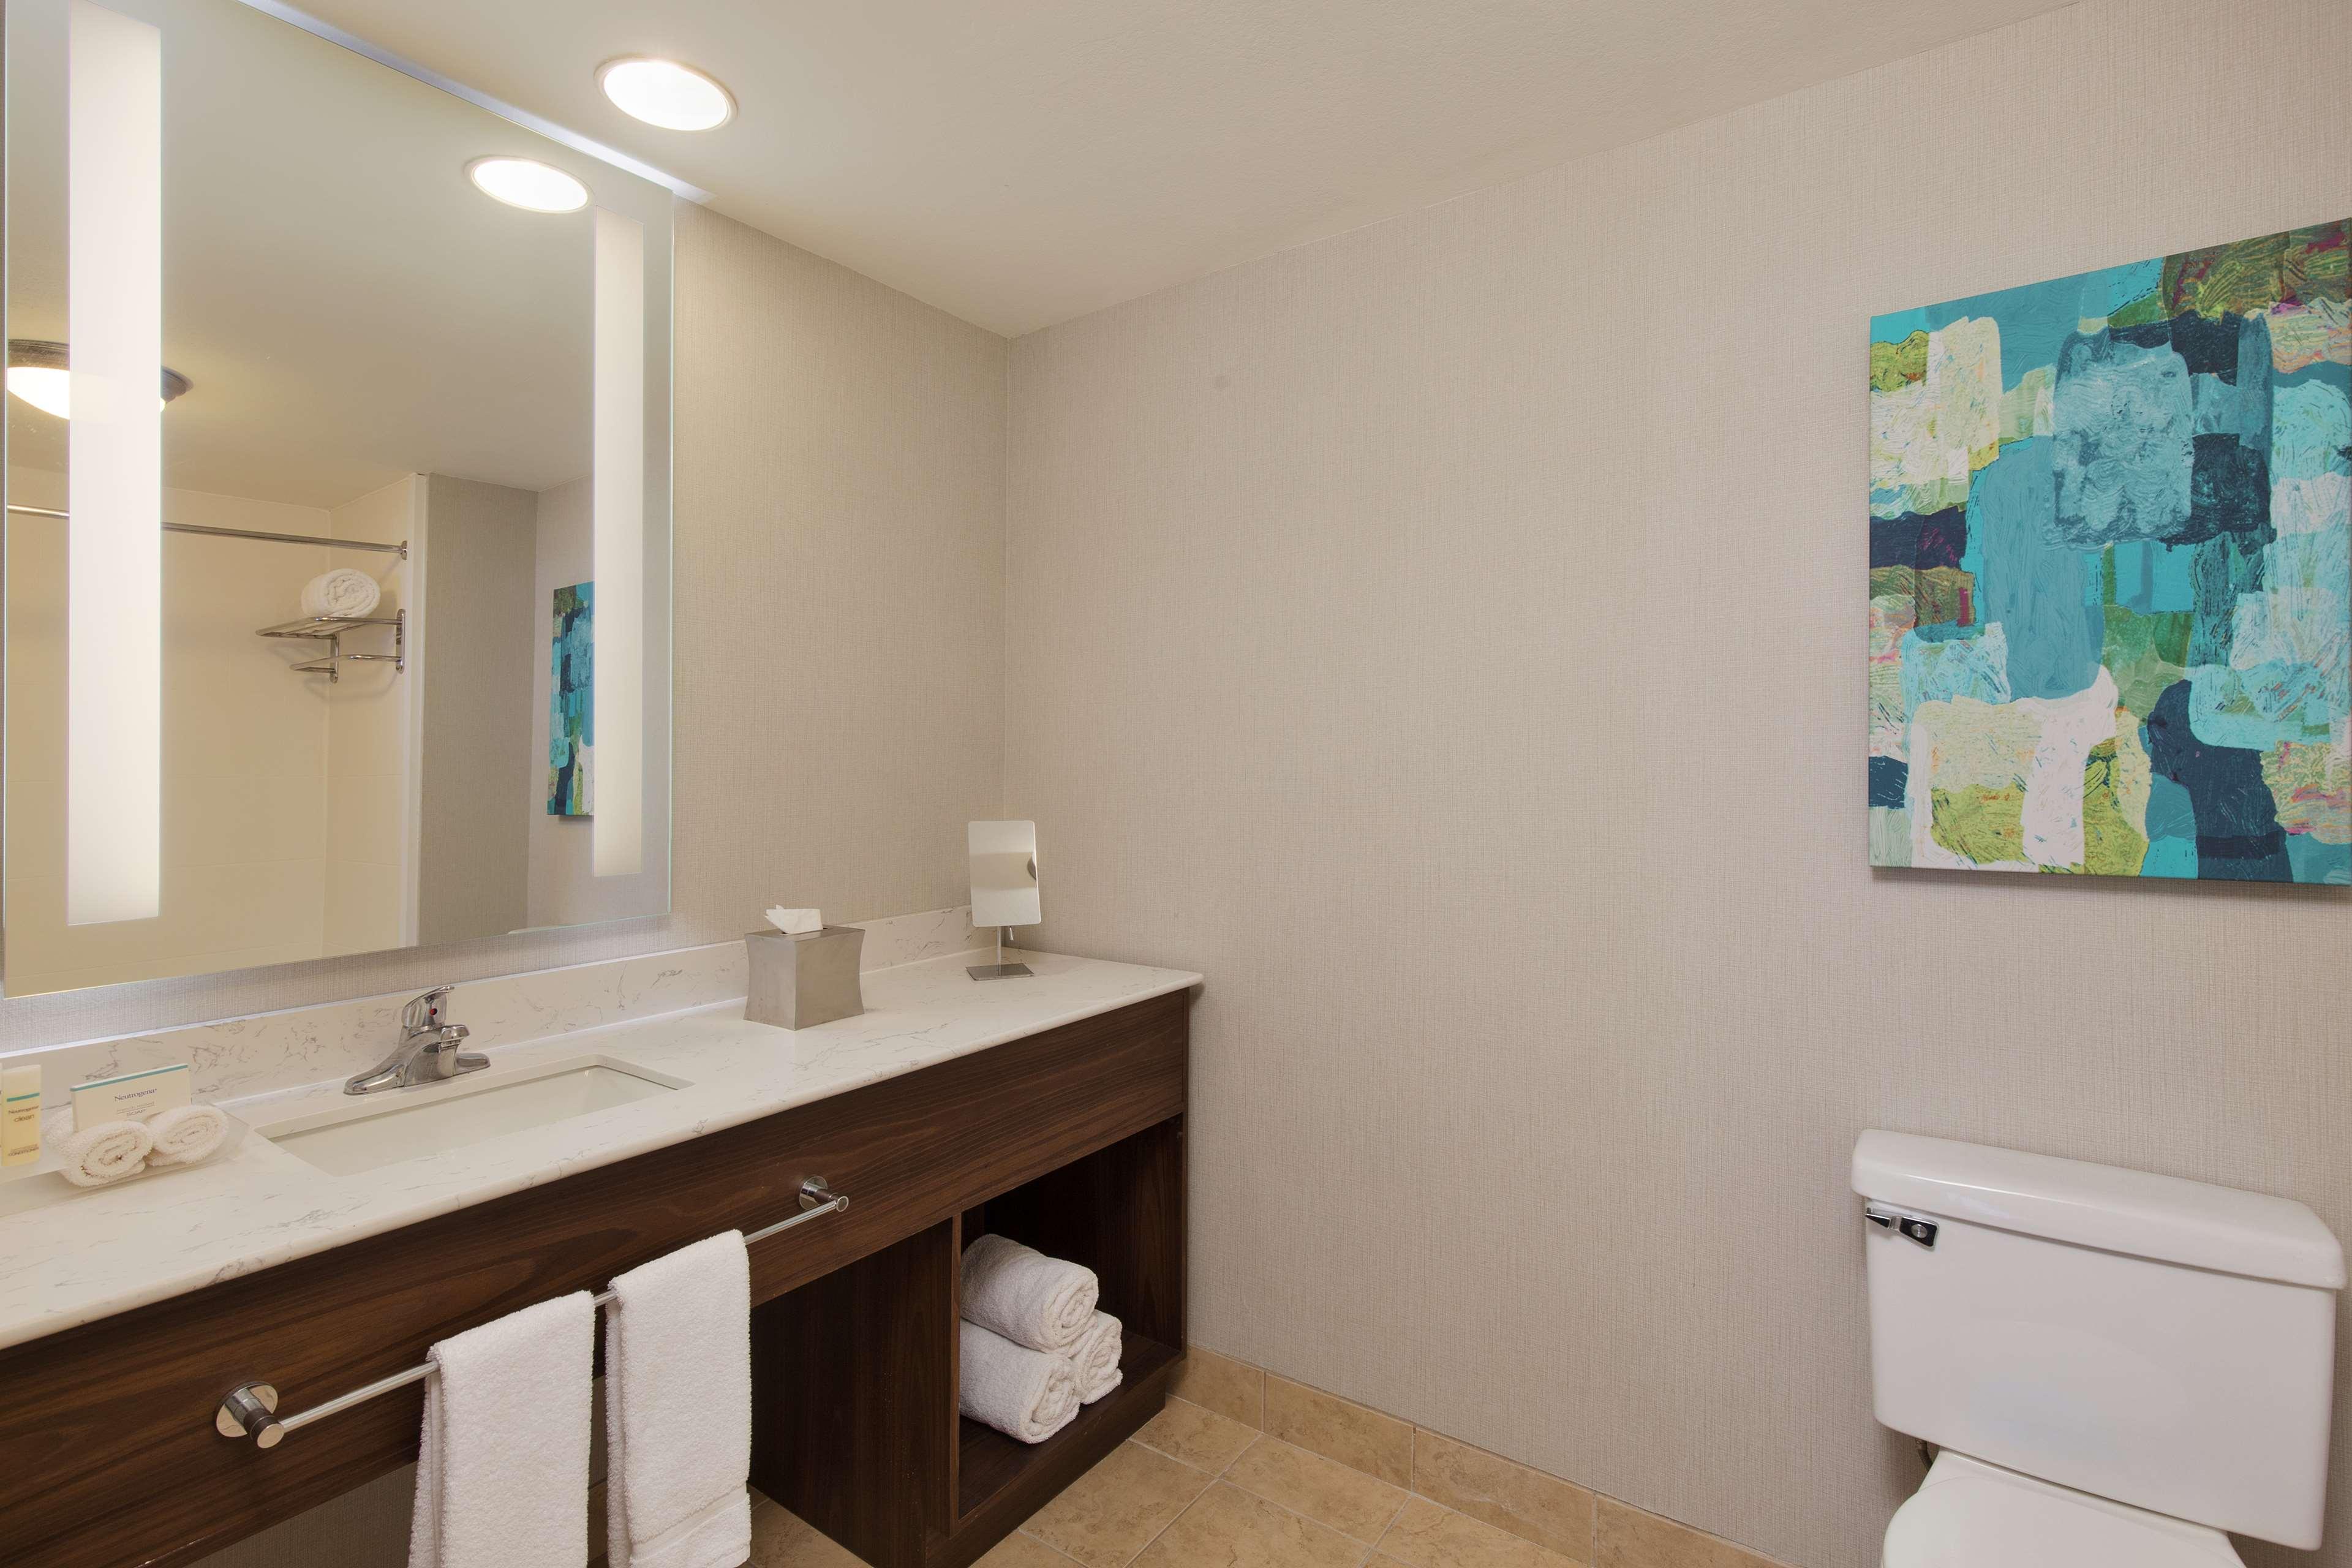 Homewood Suites by Hilton Lubbock image 17